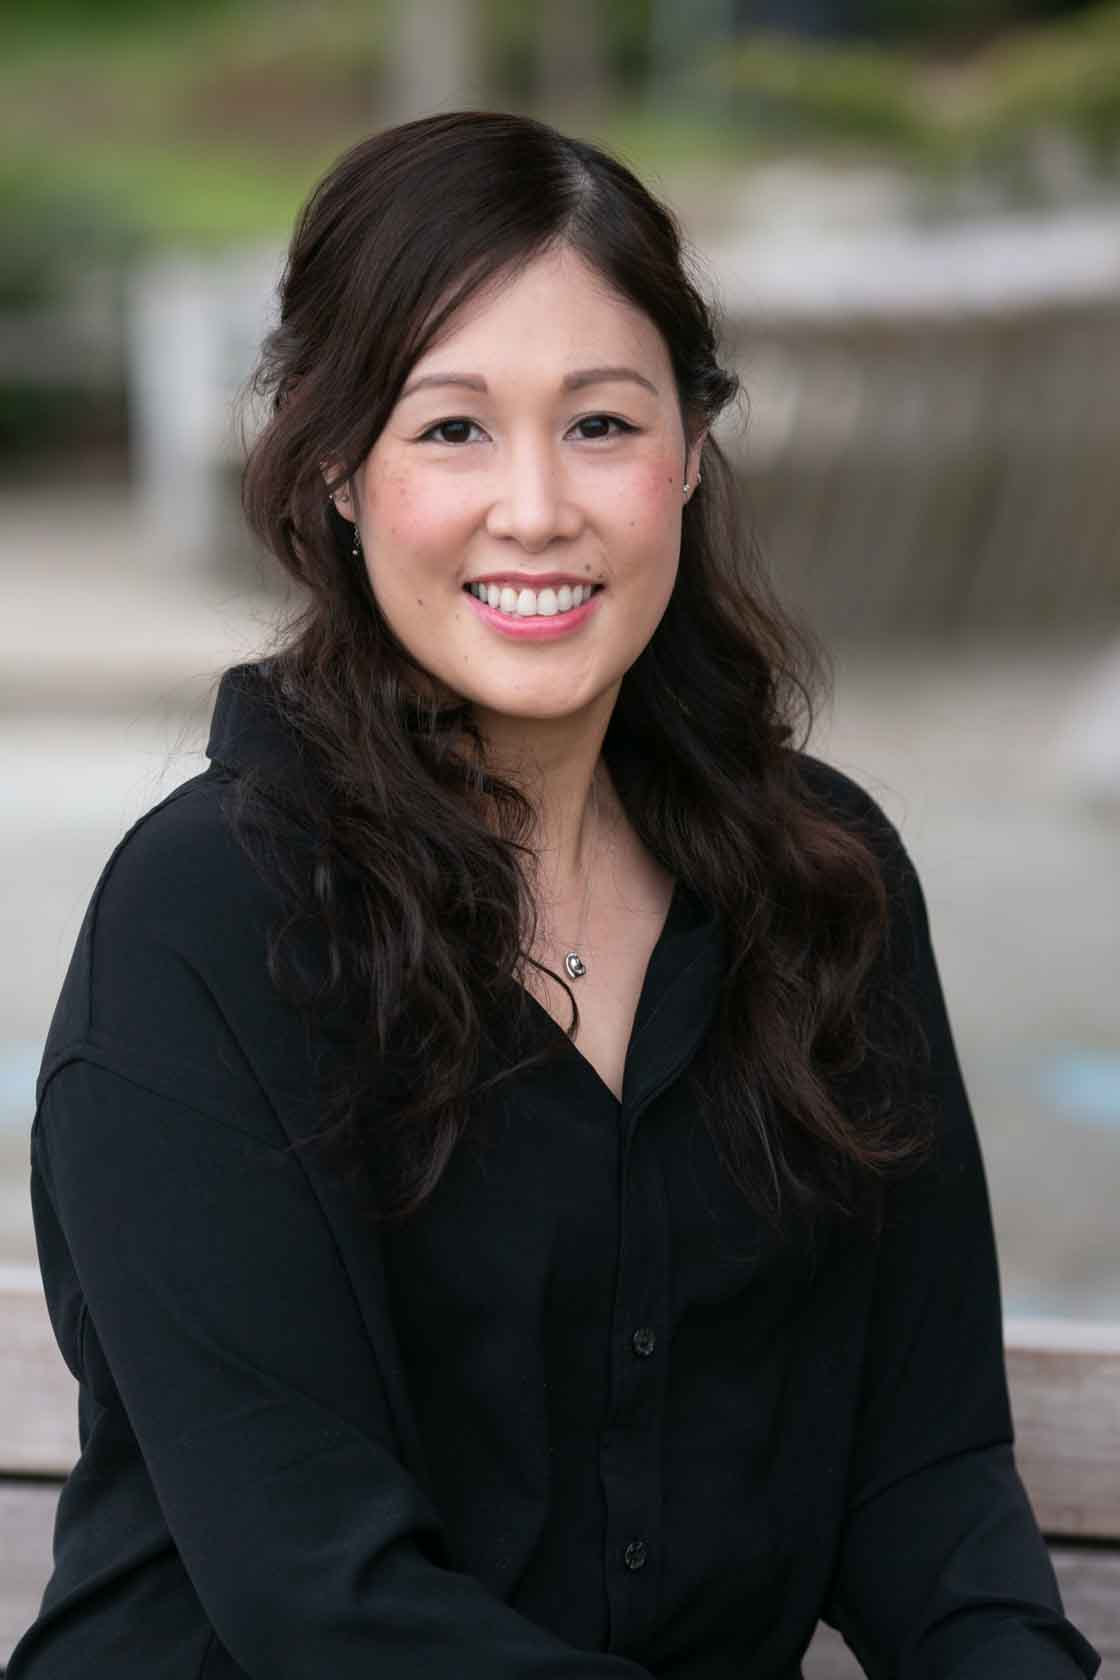 our team member Chisato